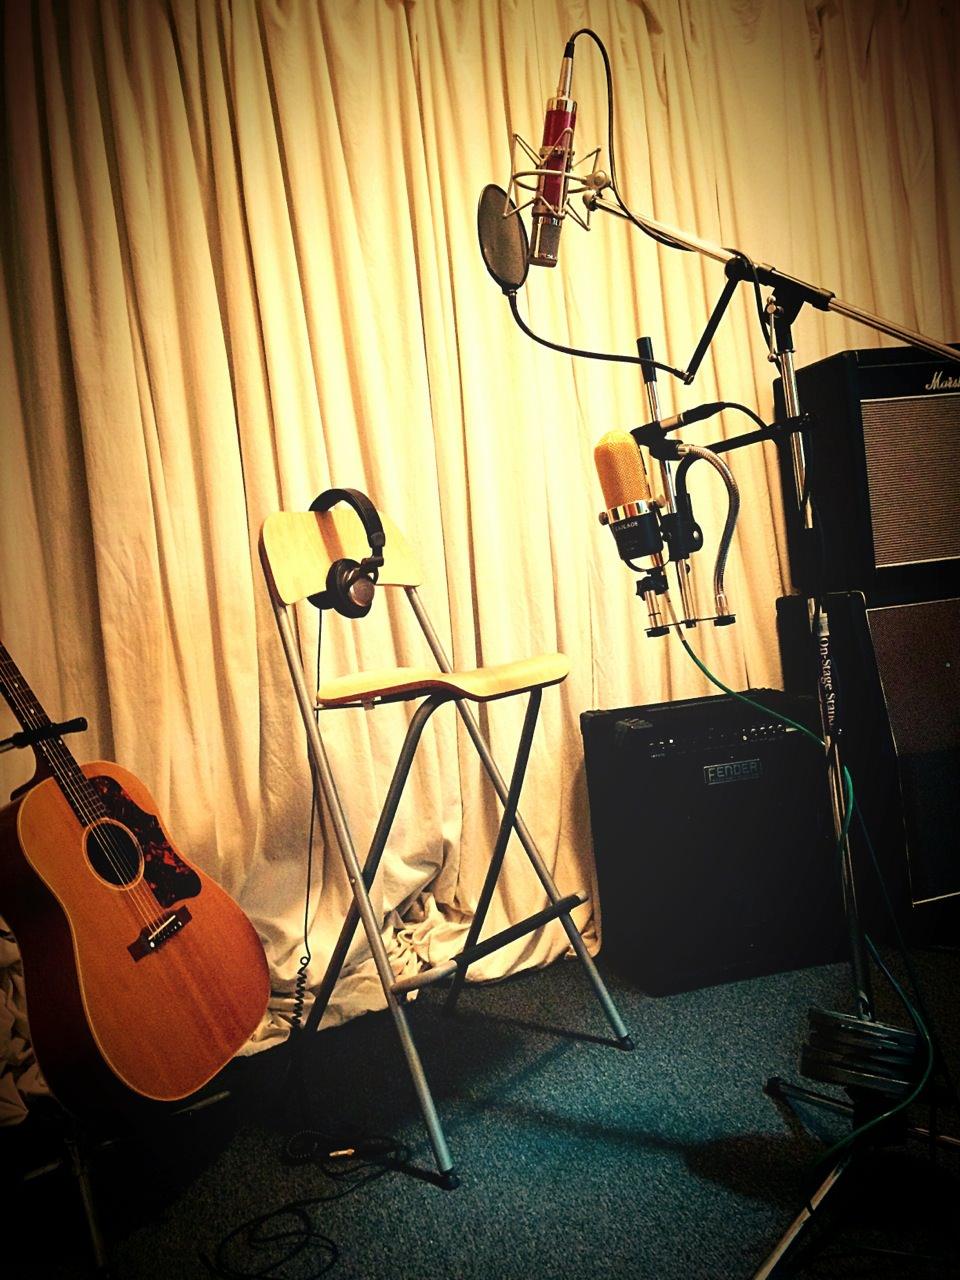 Live room setup:'57 Gibson J-50 acoustic. Avantone CV12 tube condenser on vocal. Victor ribbon & Michael Joly small diaphragm condenser mics for guitar.